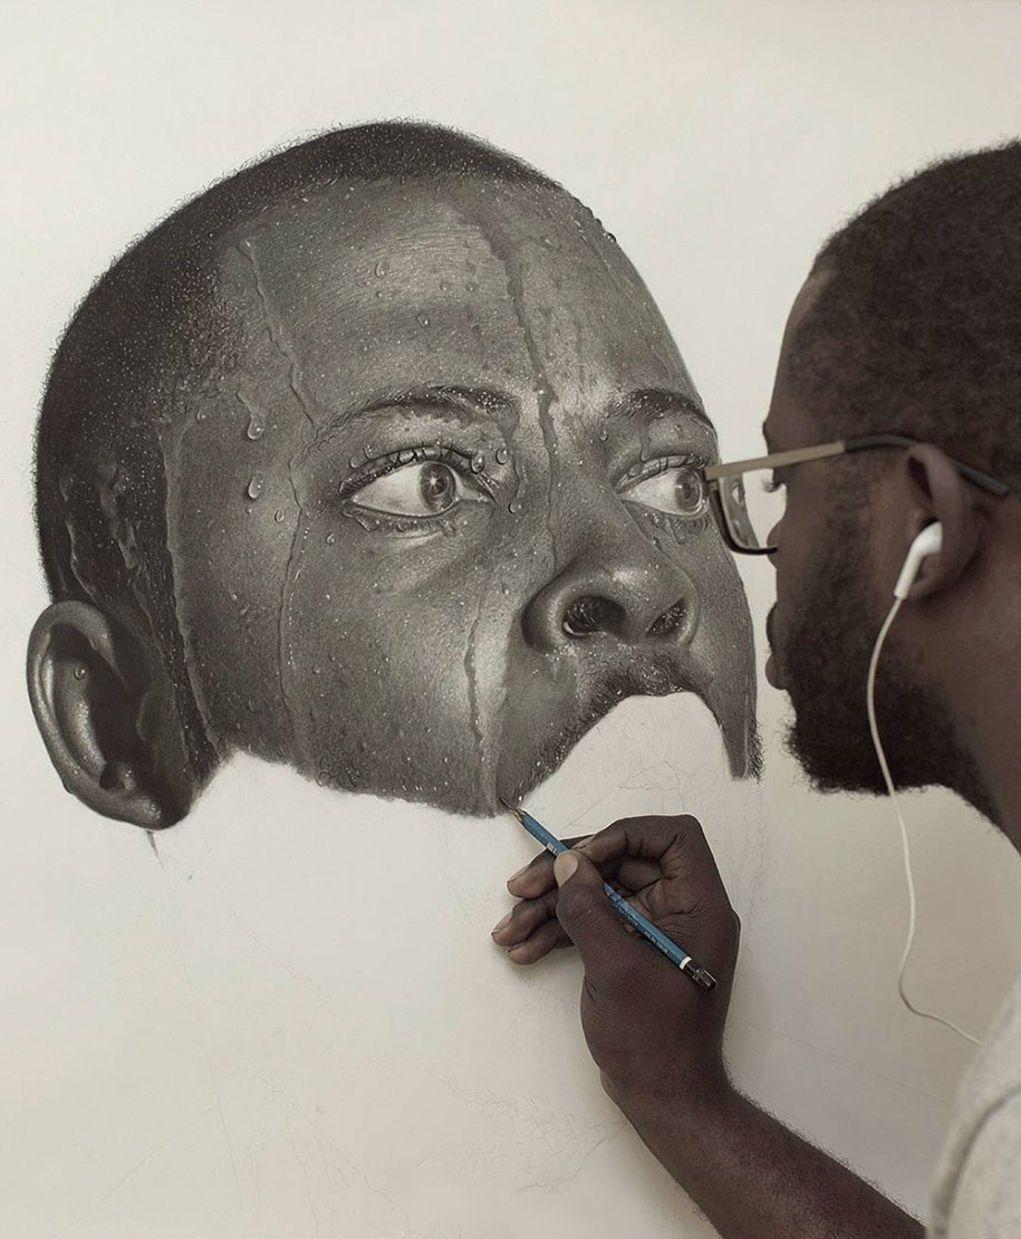 Artist Uses Pencils To Create Striking Hyper Realistic Portraits - Artist uses pencils to create striking hyper realistic portraits